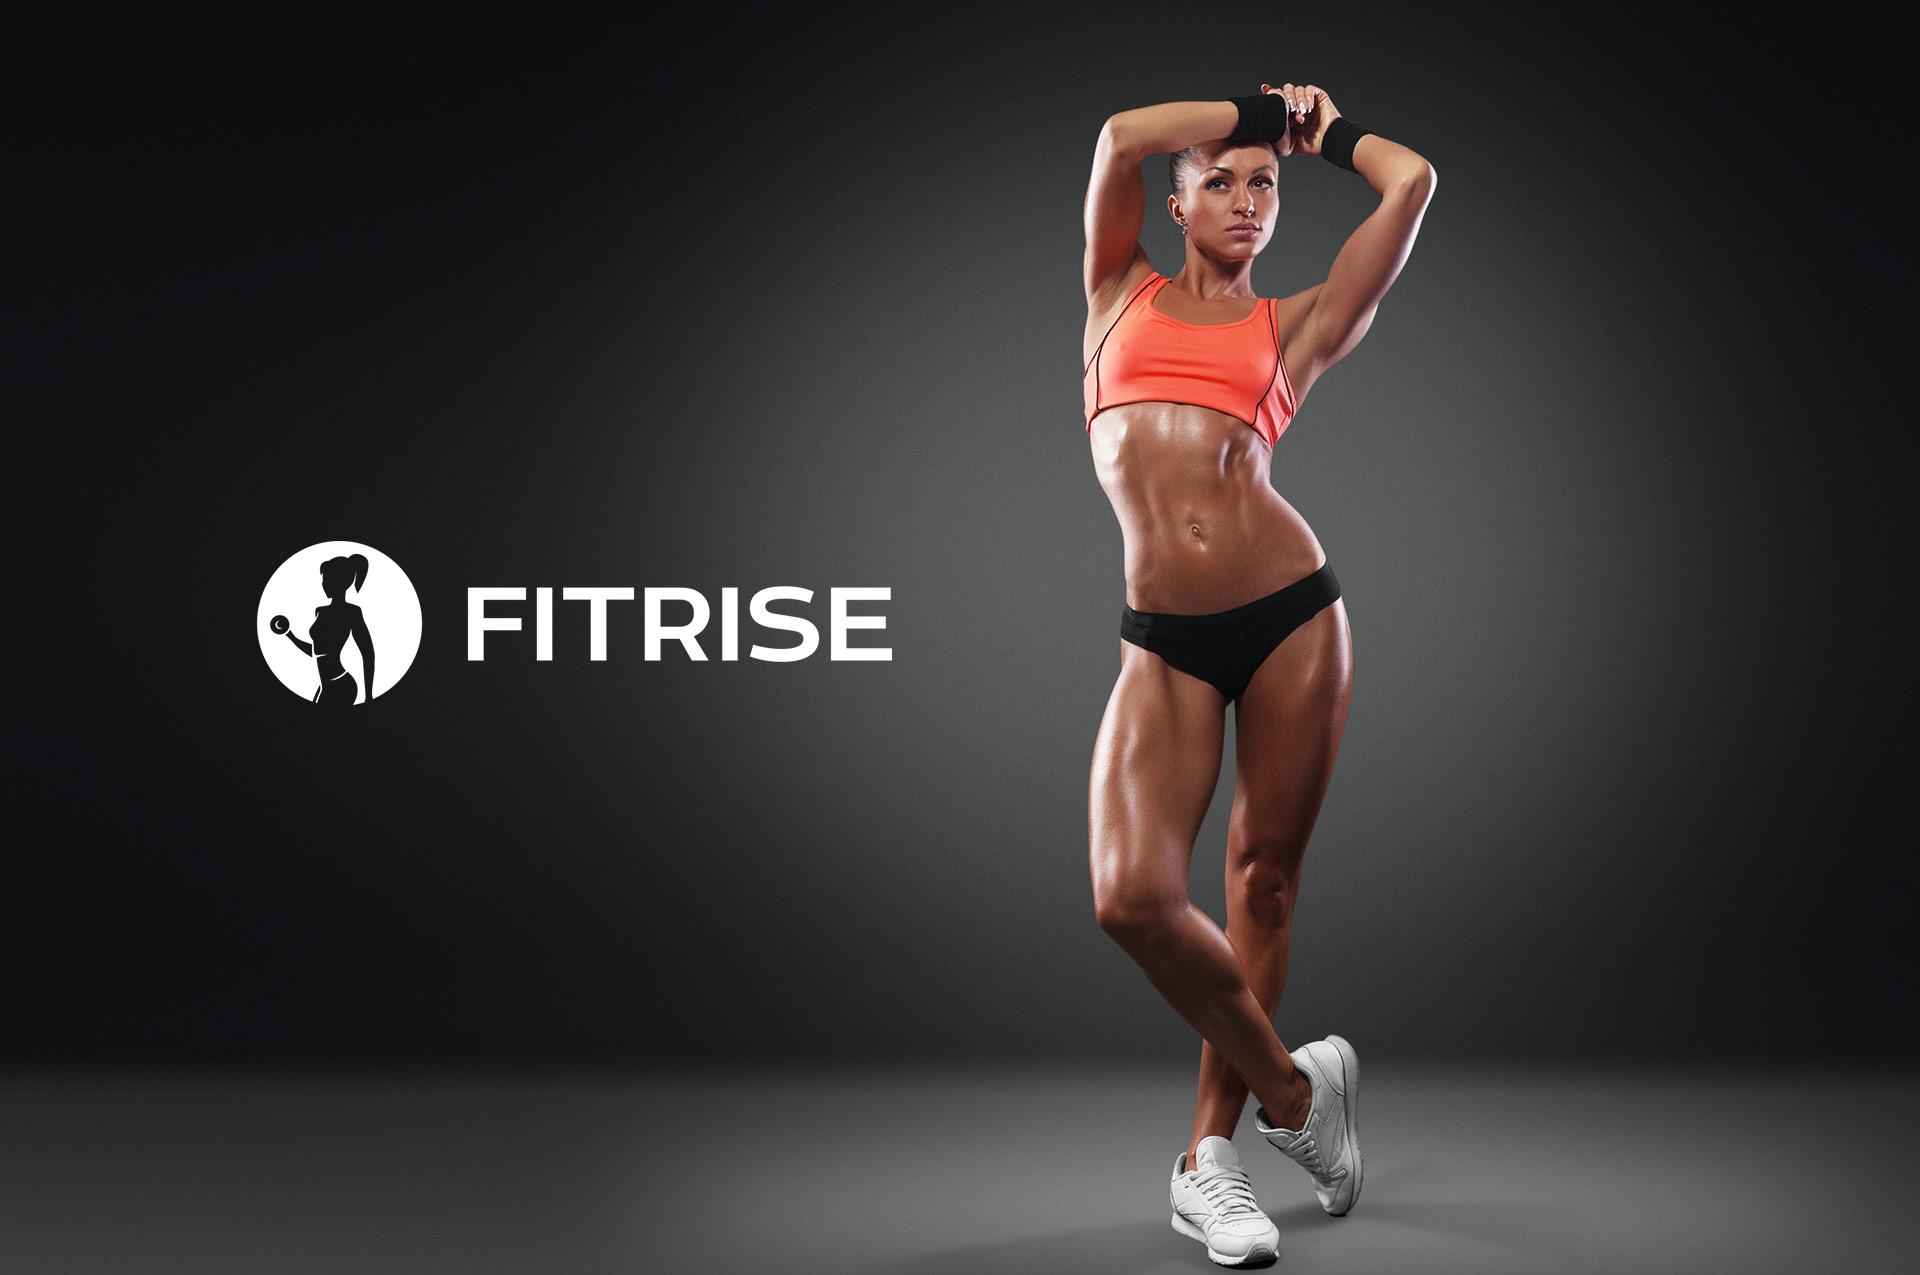 придумать название для онлайн школы похудения и спорта фото f_1085aa9794a21059.jpg